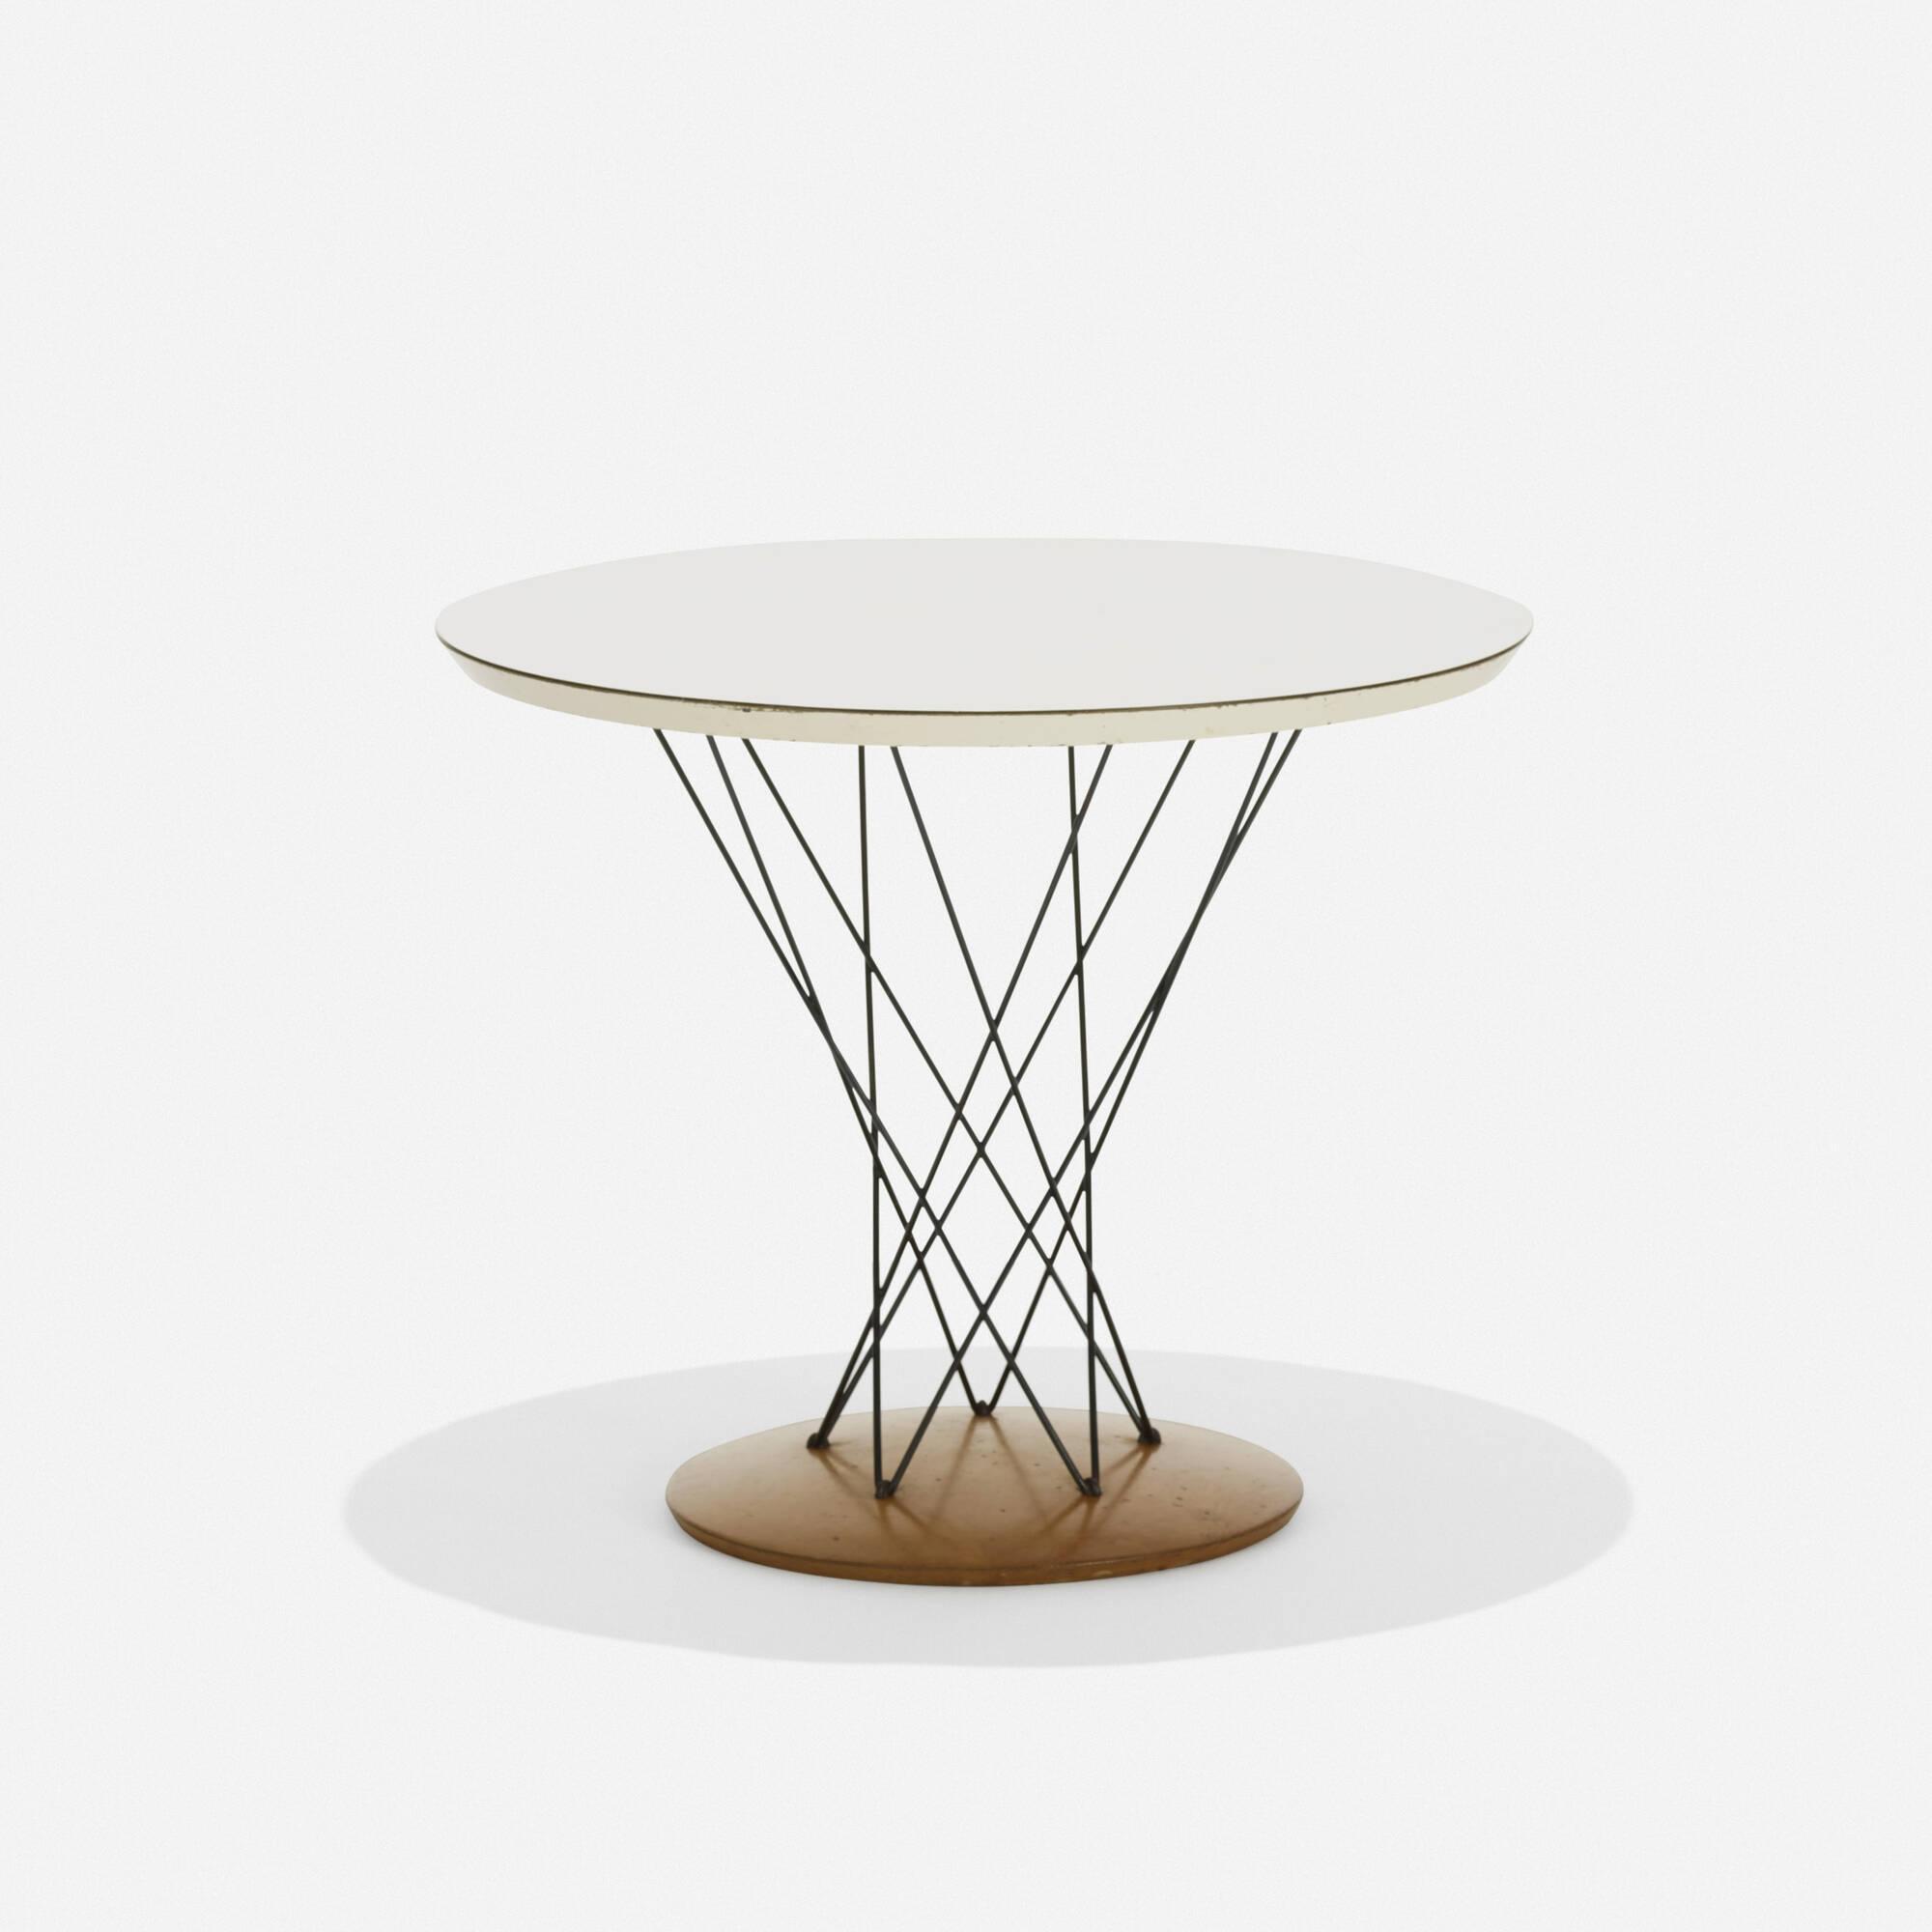 129: Isamu Noguchi / child's table, model 87 (1 of 2)